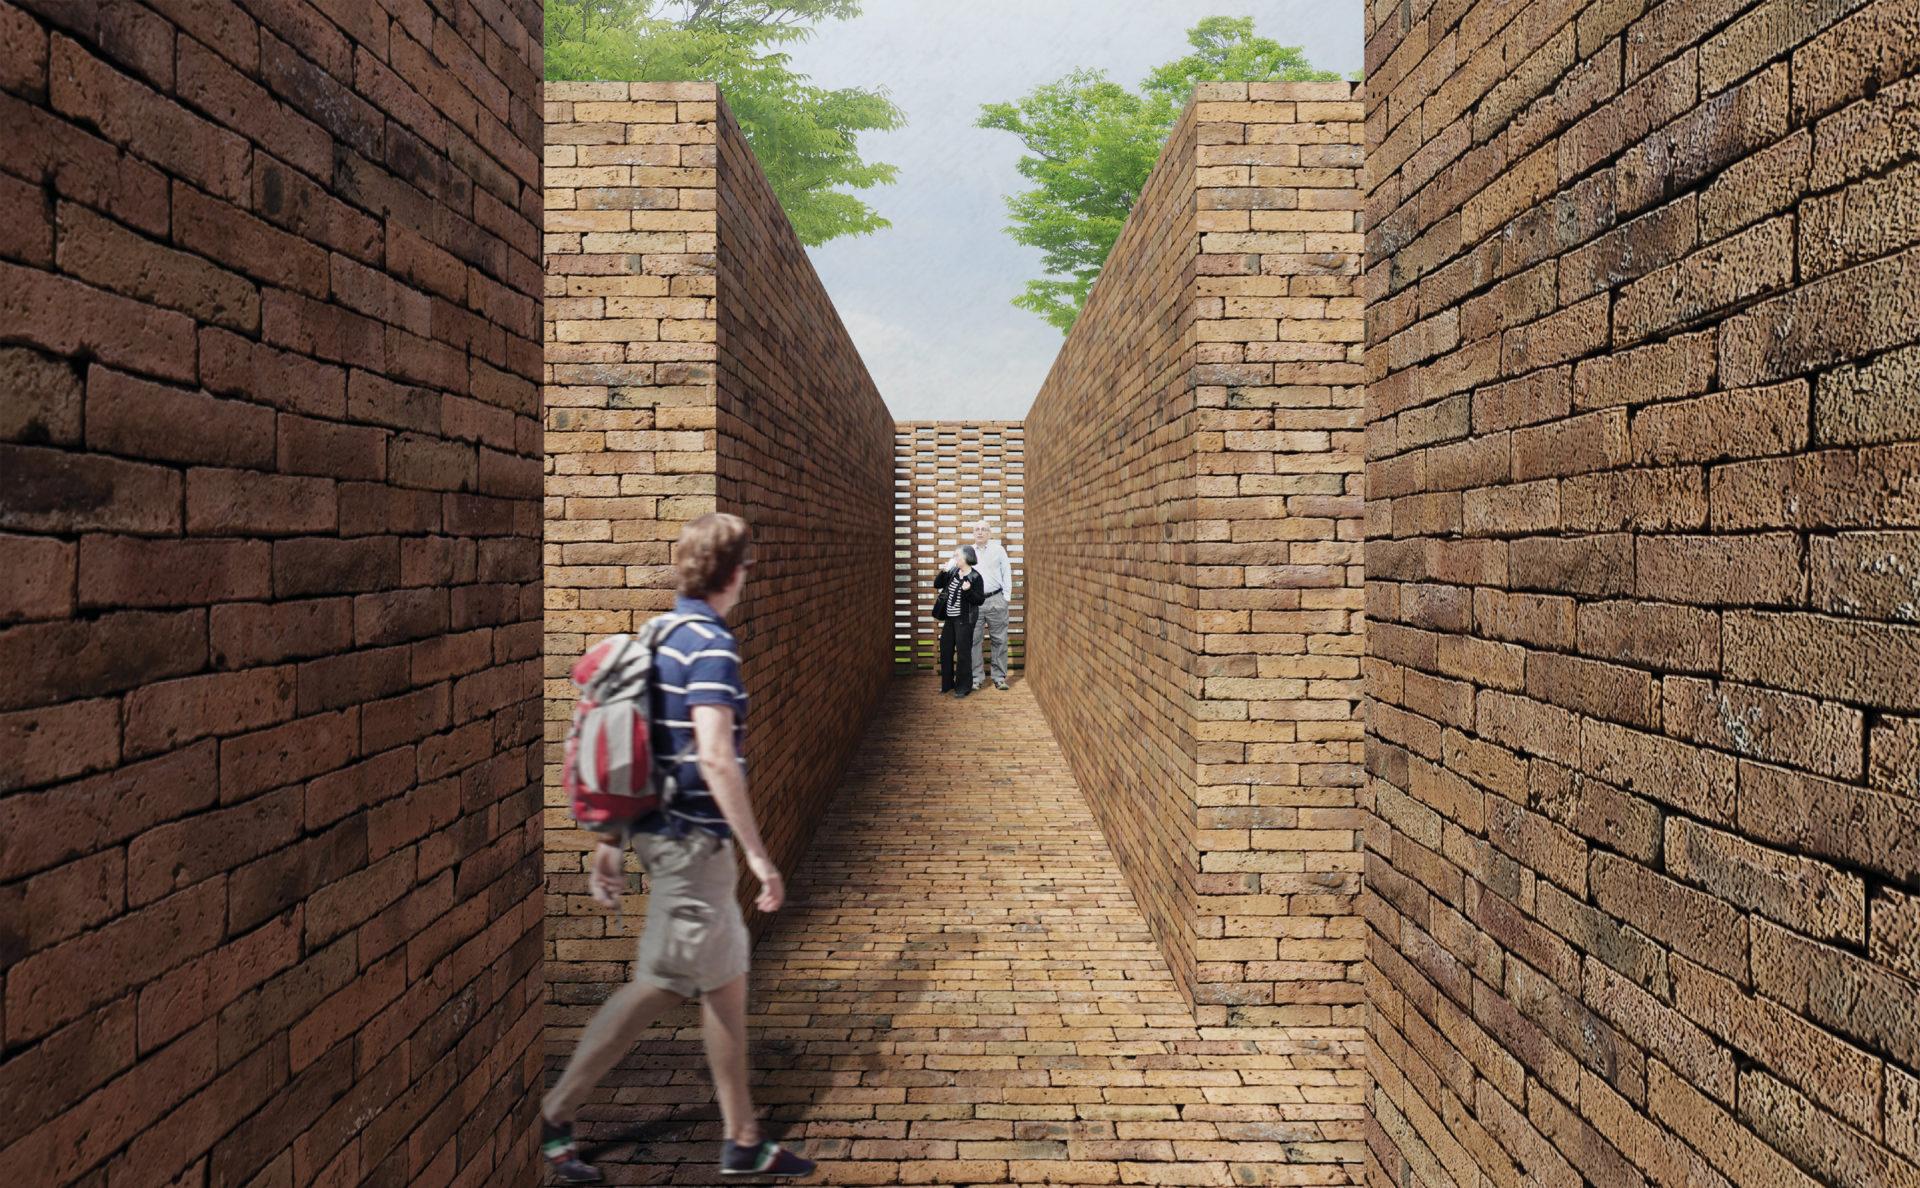 komunismus labyrint